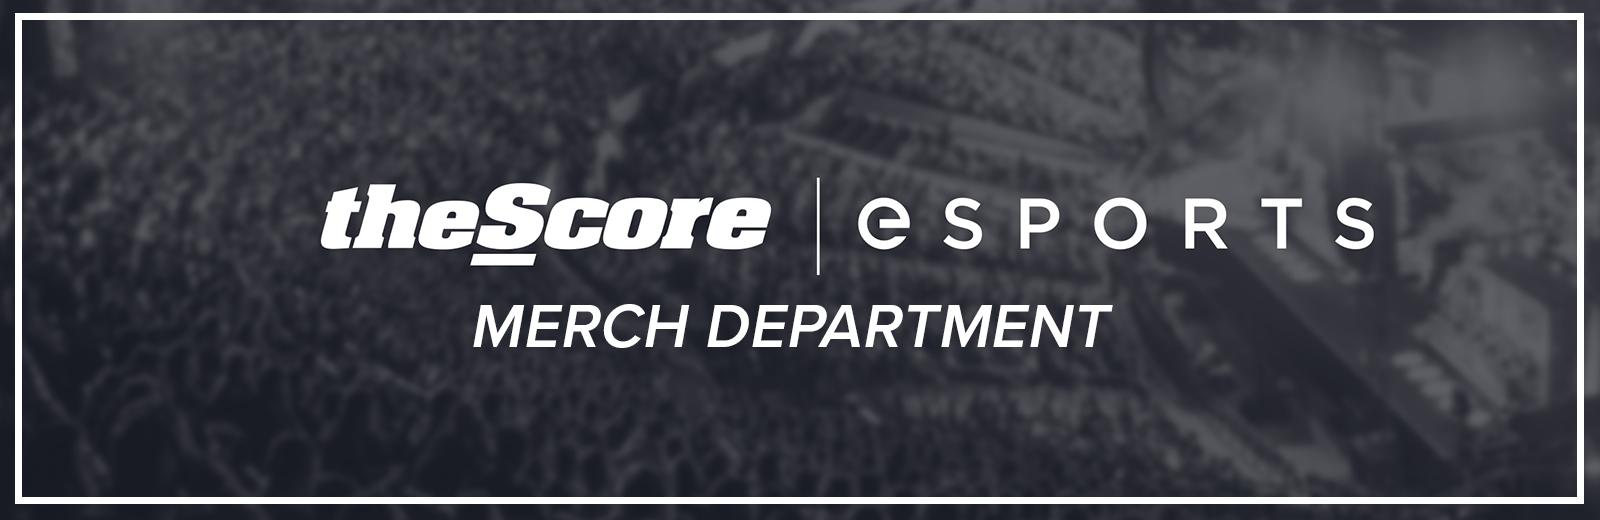 theScore esports Store